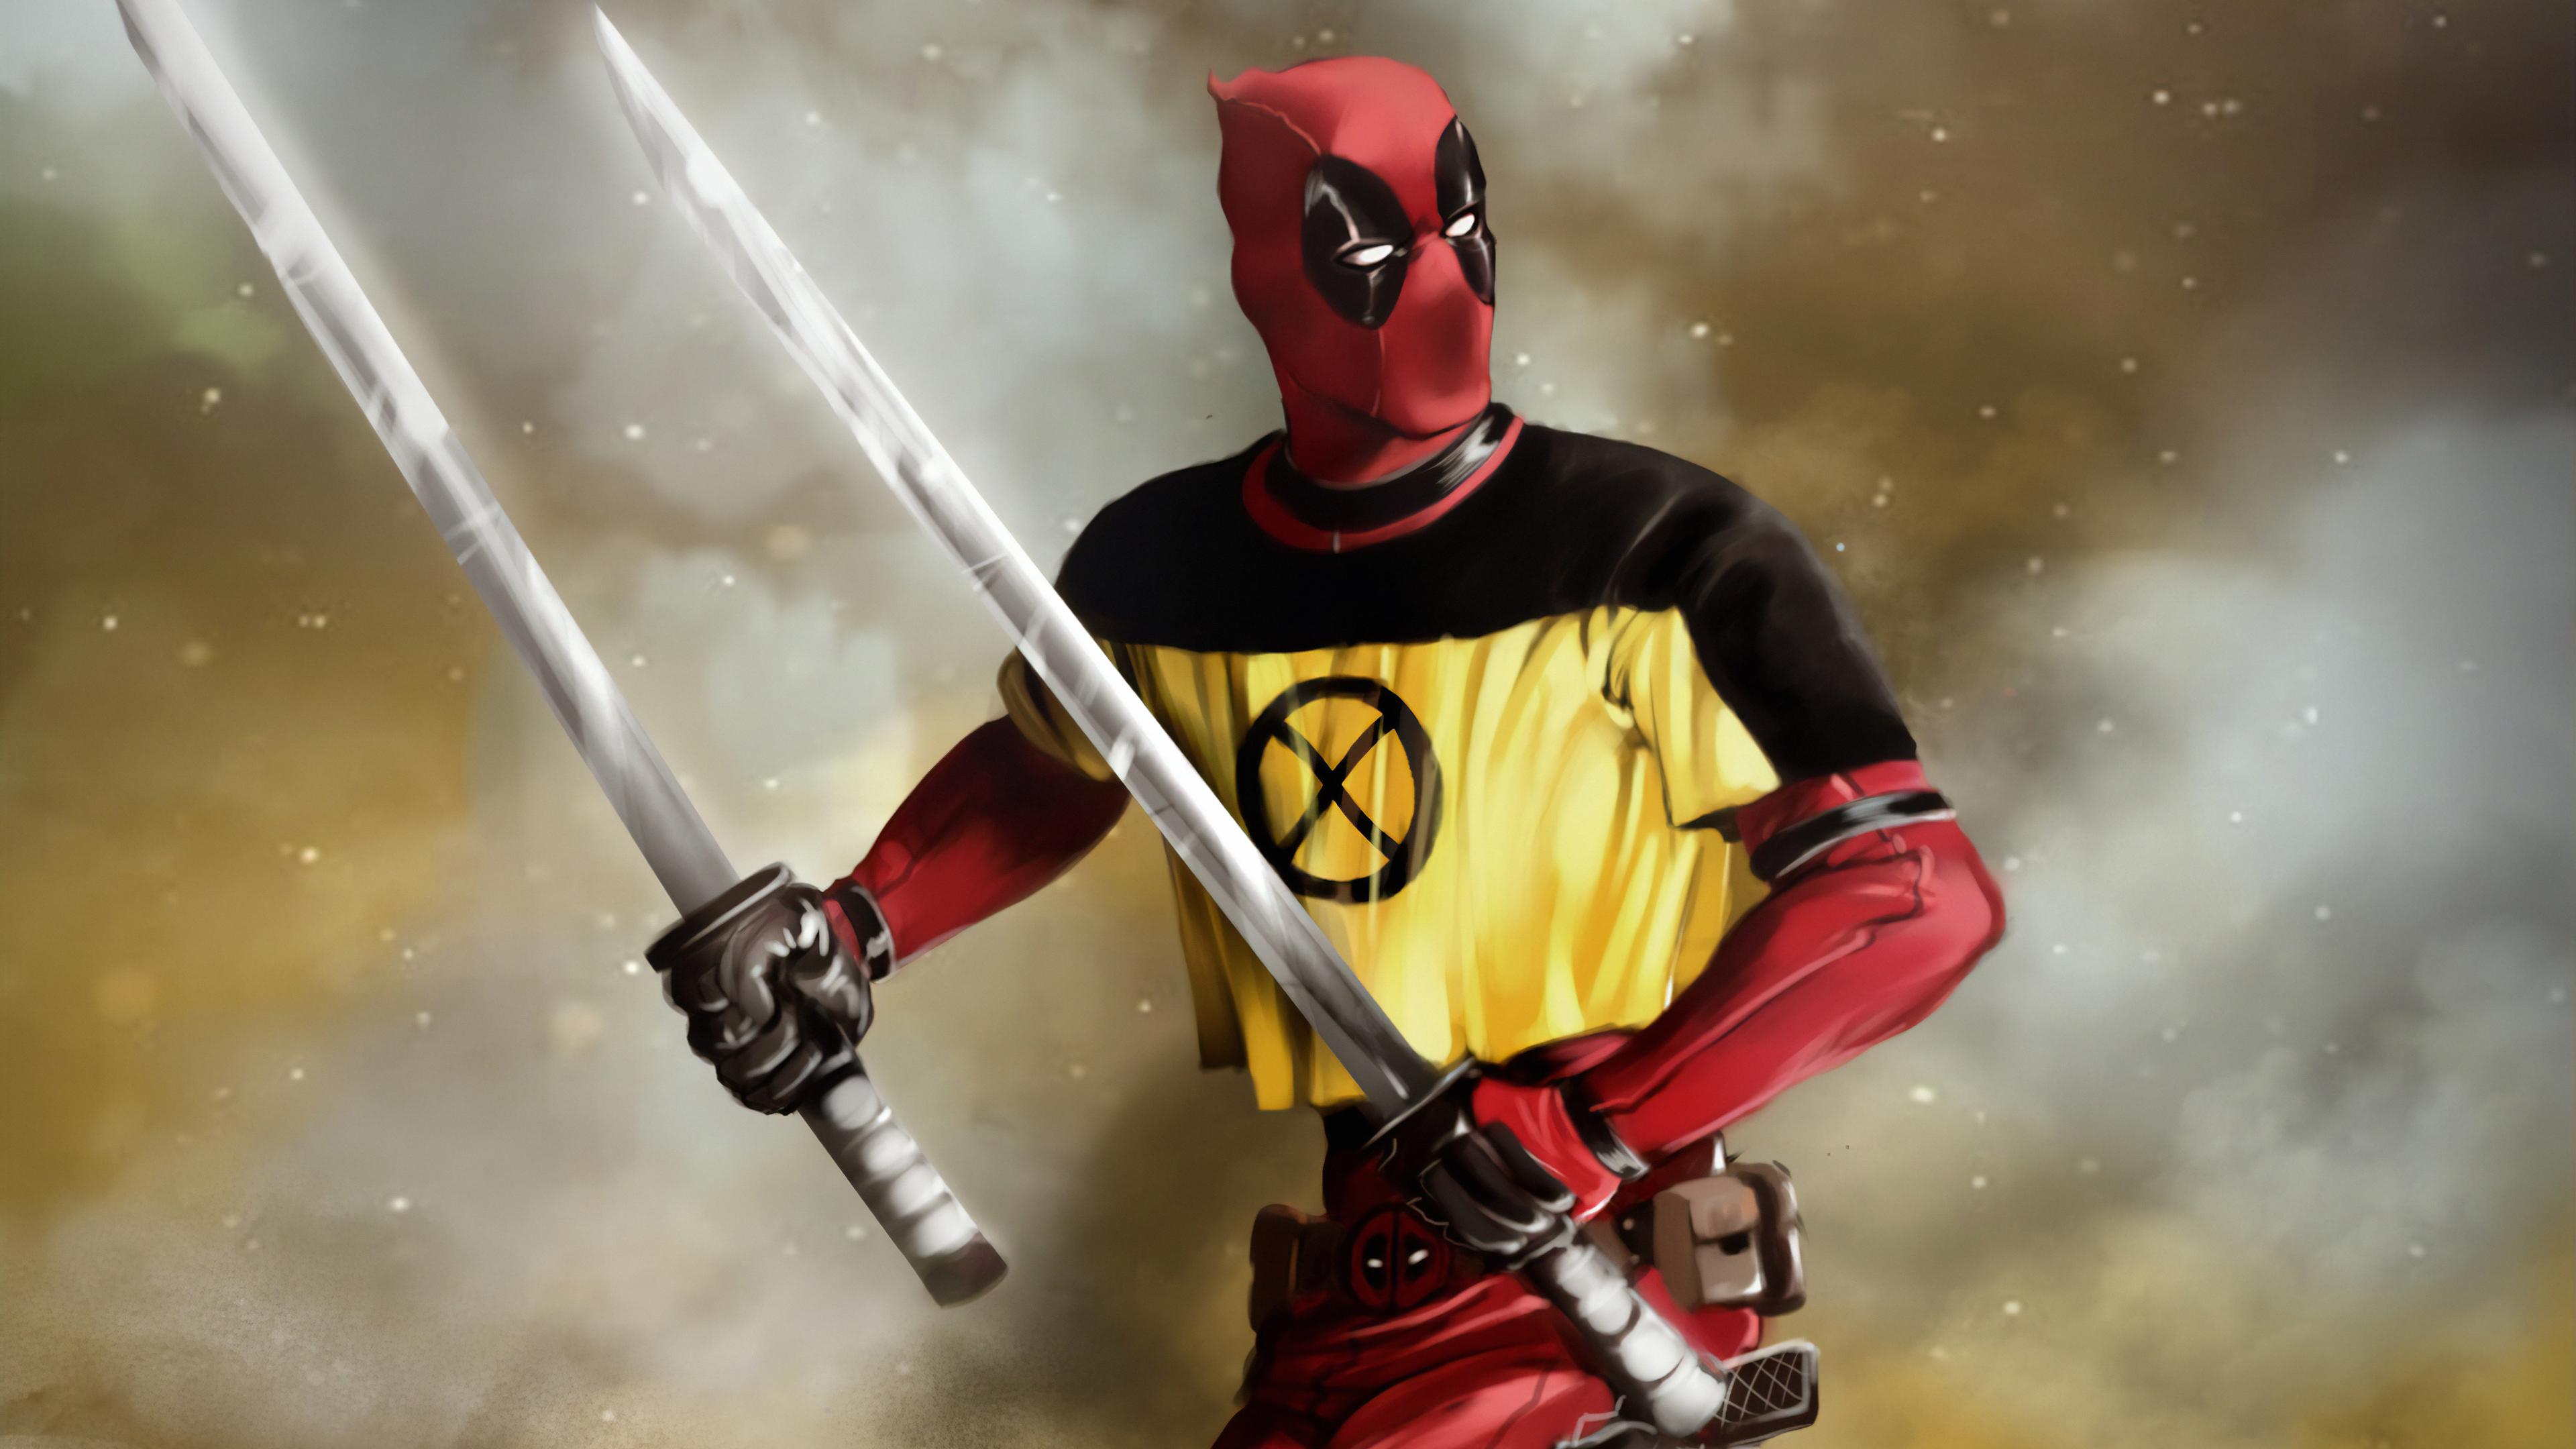 deadpool sword 1570394677 - Deadpool Sword - superheroes wallpapers, hd-wallpapers, digital art wallpapers, deadpool wallpapers, artwork wallpapers, artstation wallpapers, 4k-wallpapers